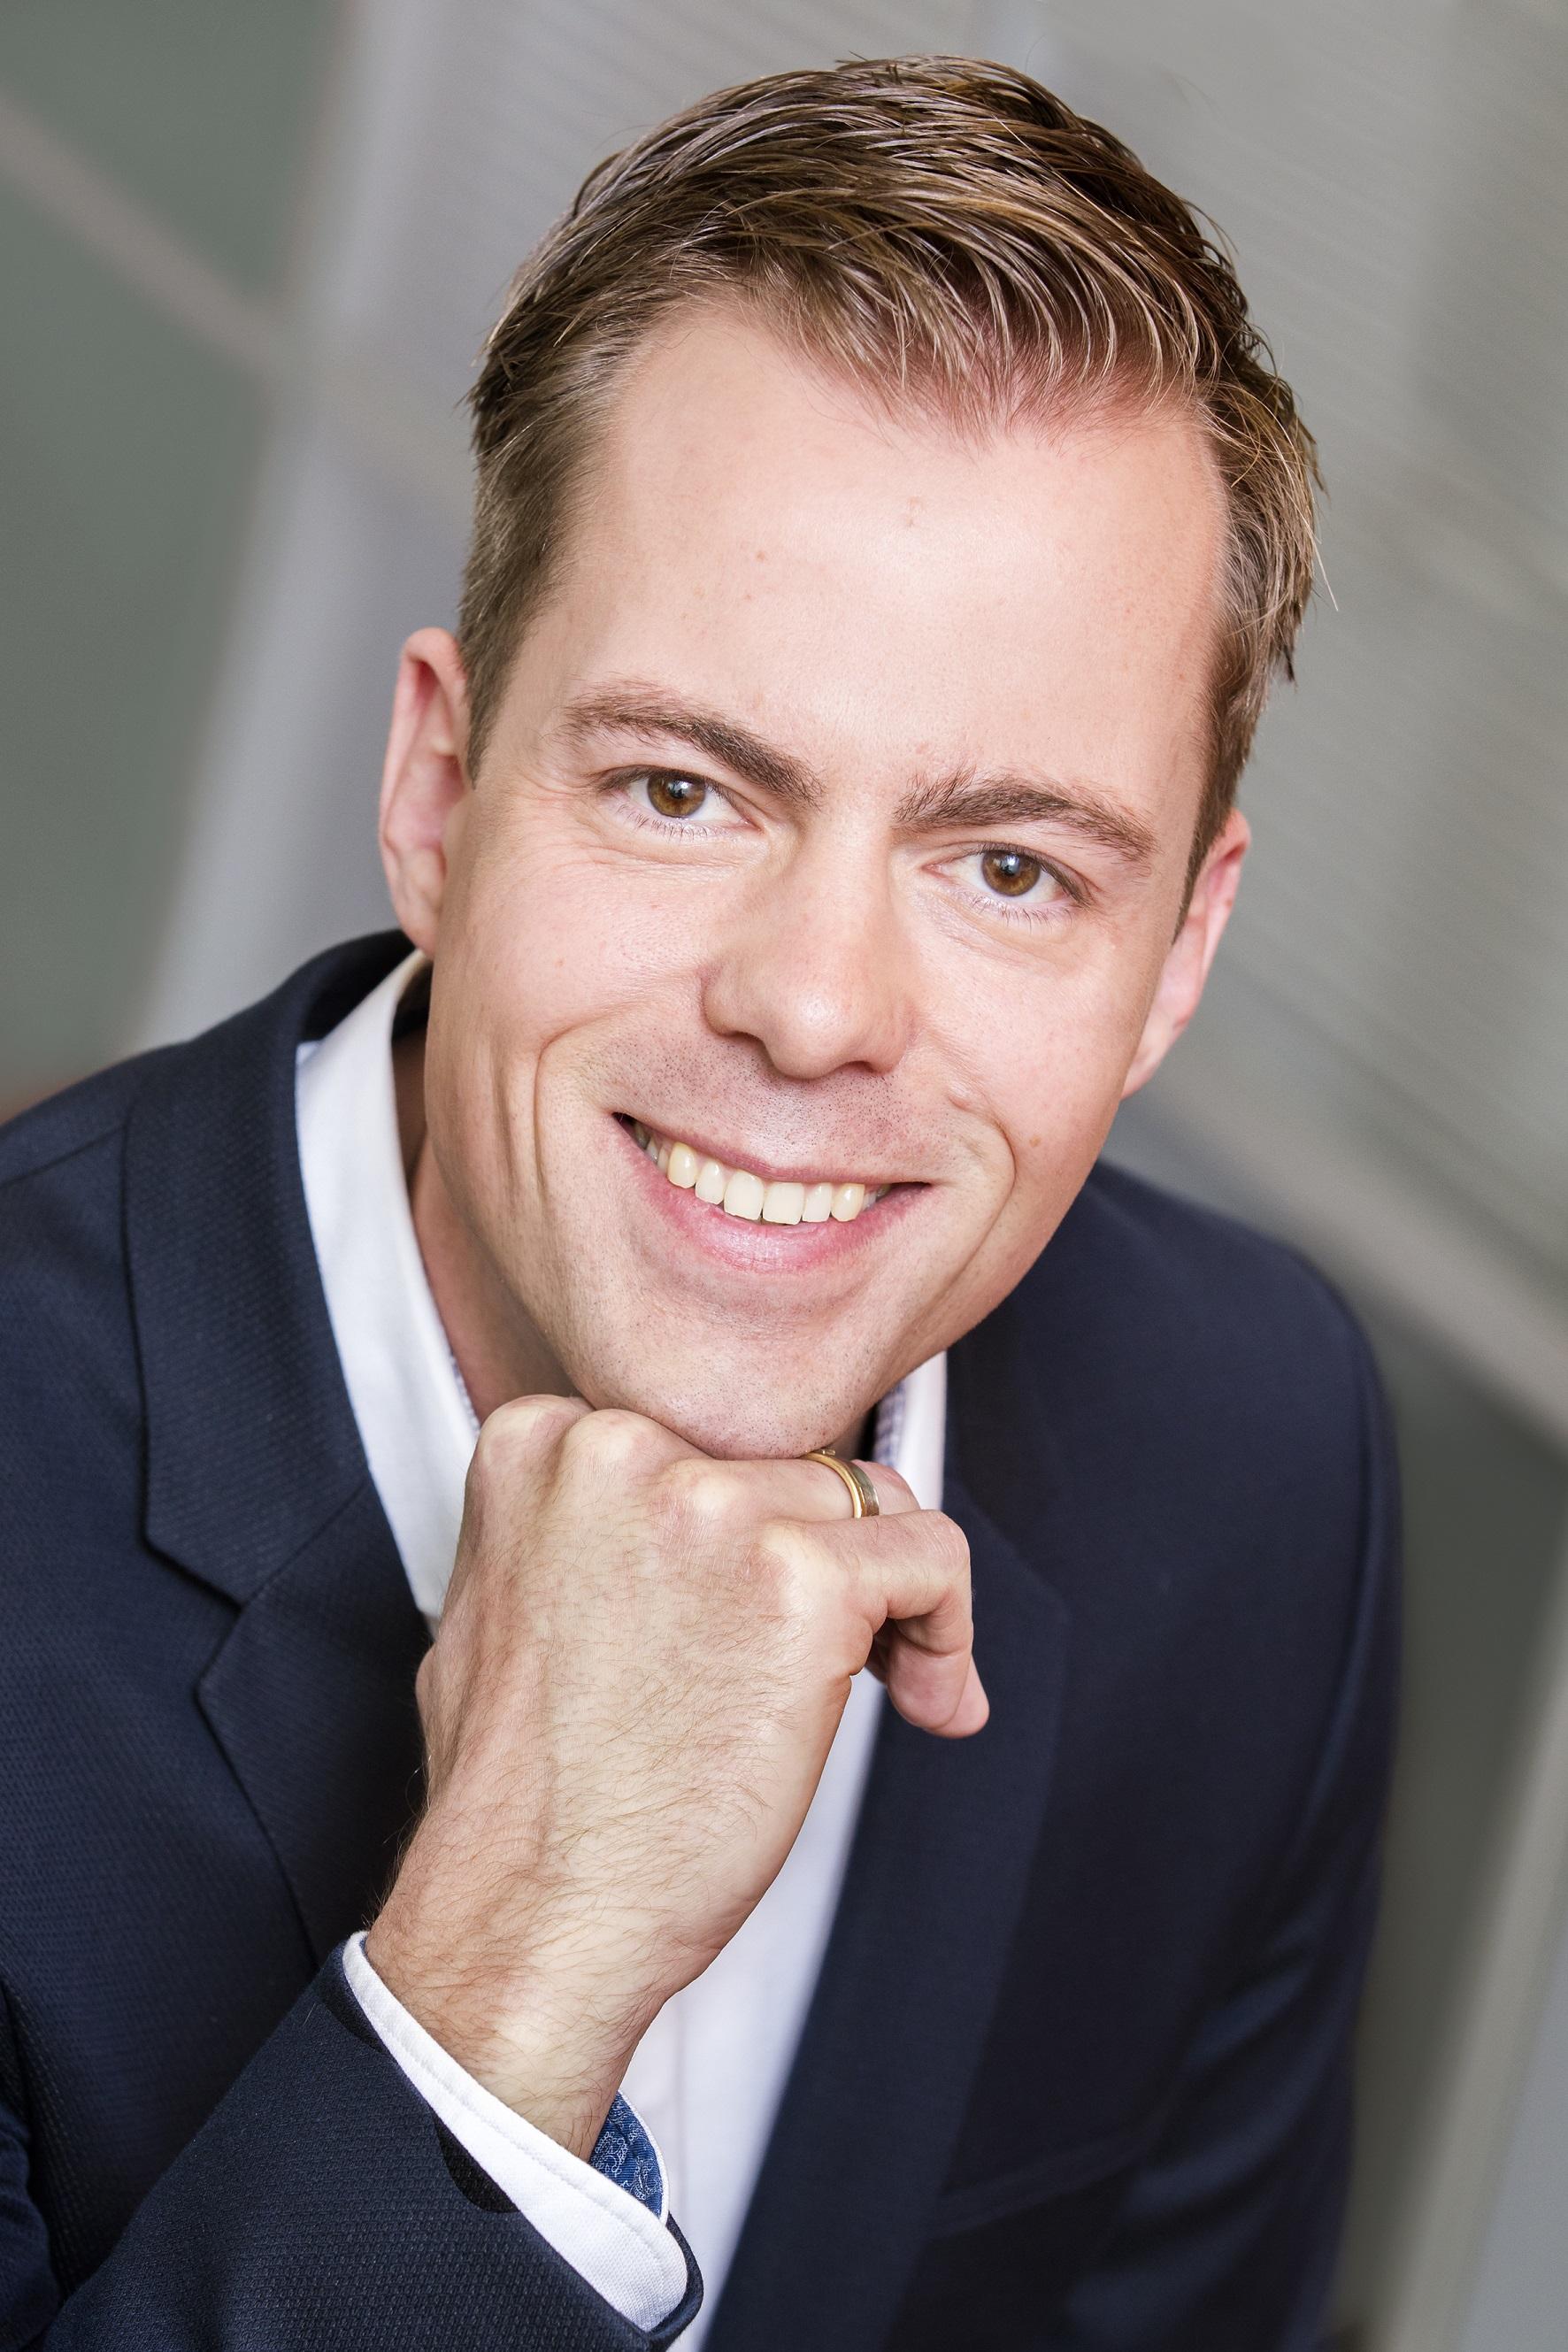 Patrick Tieleman, nieuwe Director Operations McDonald's Nederland. Bron: FranchiseFormules.NL